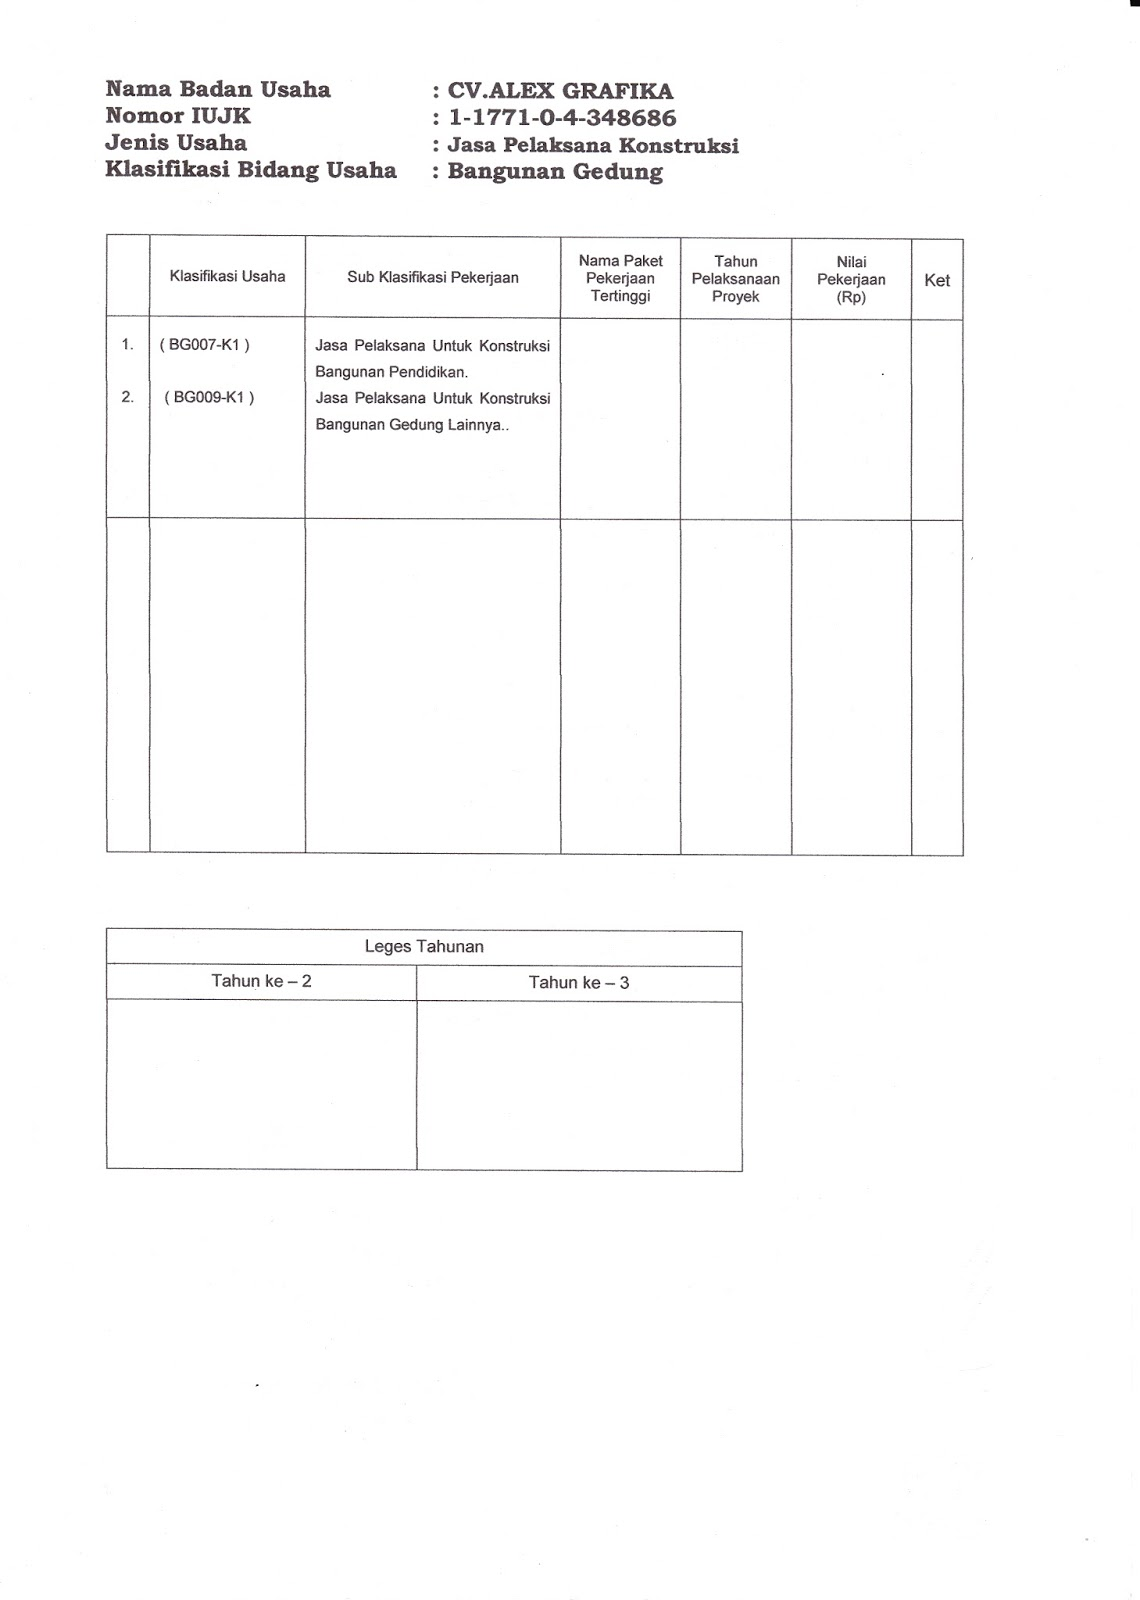 Izin Usaha Jasa Konstruksi Nasional - IUJK CV. ALEX GRAFIKA